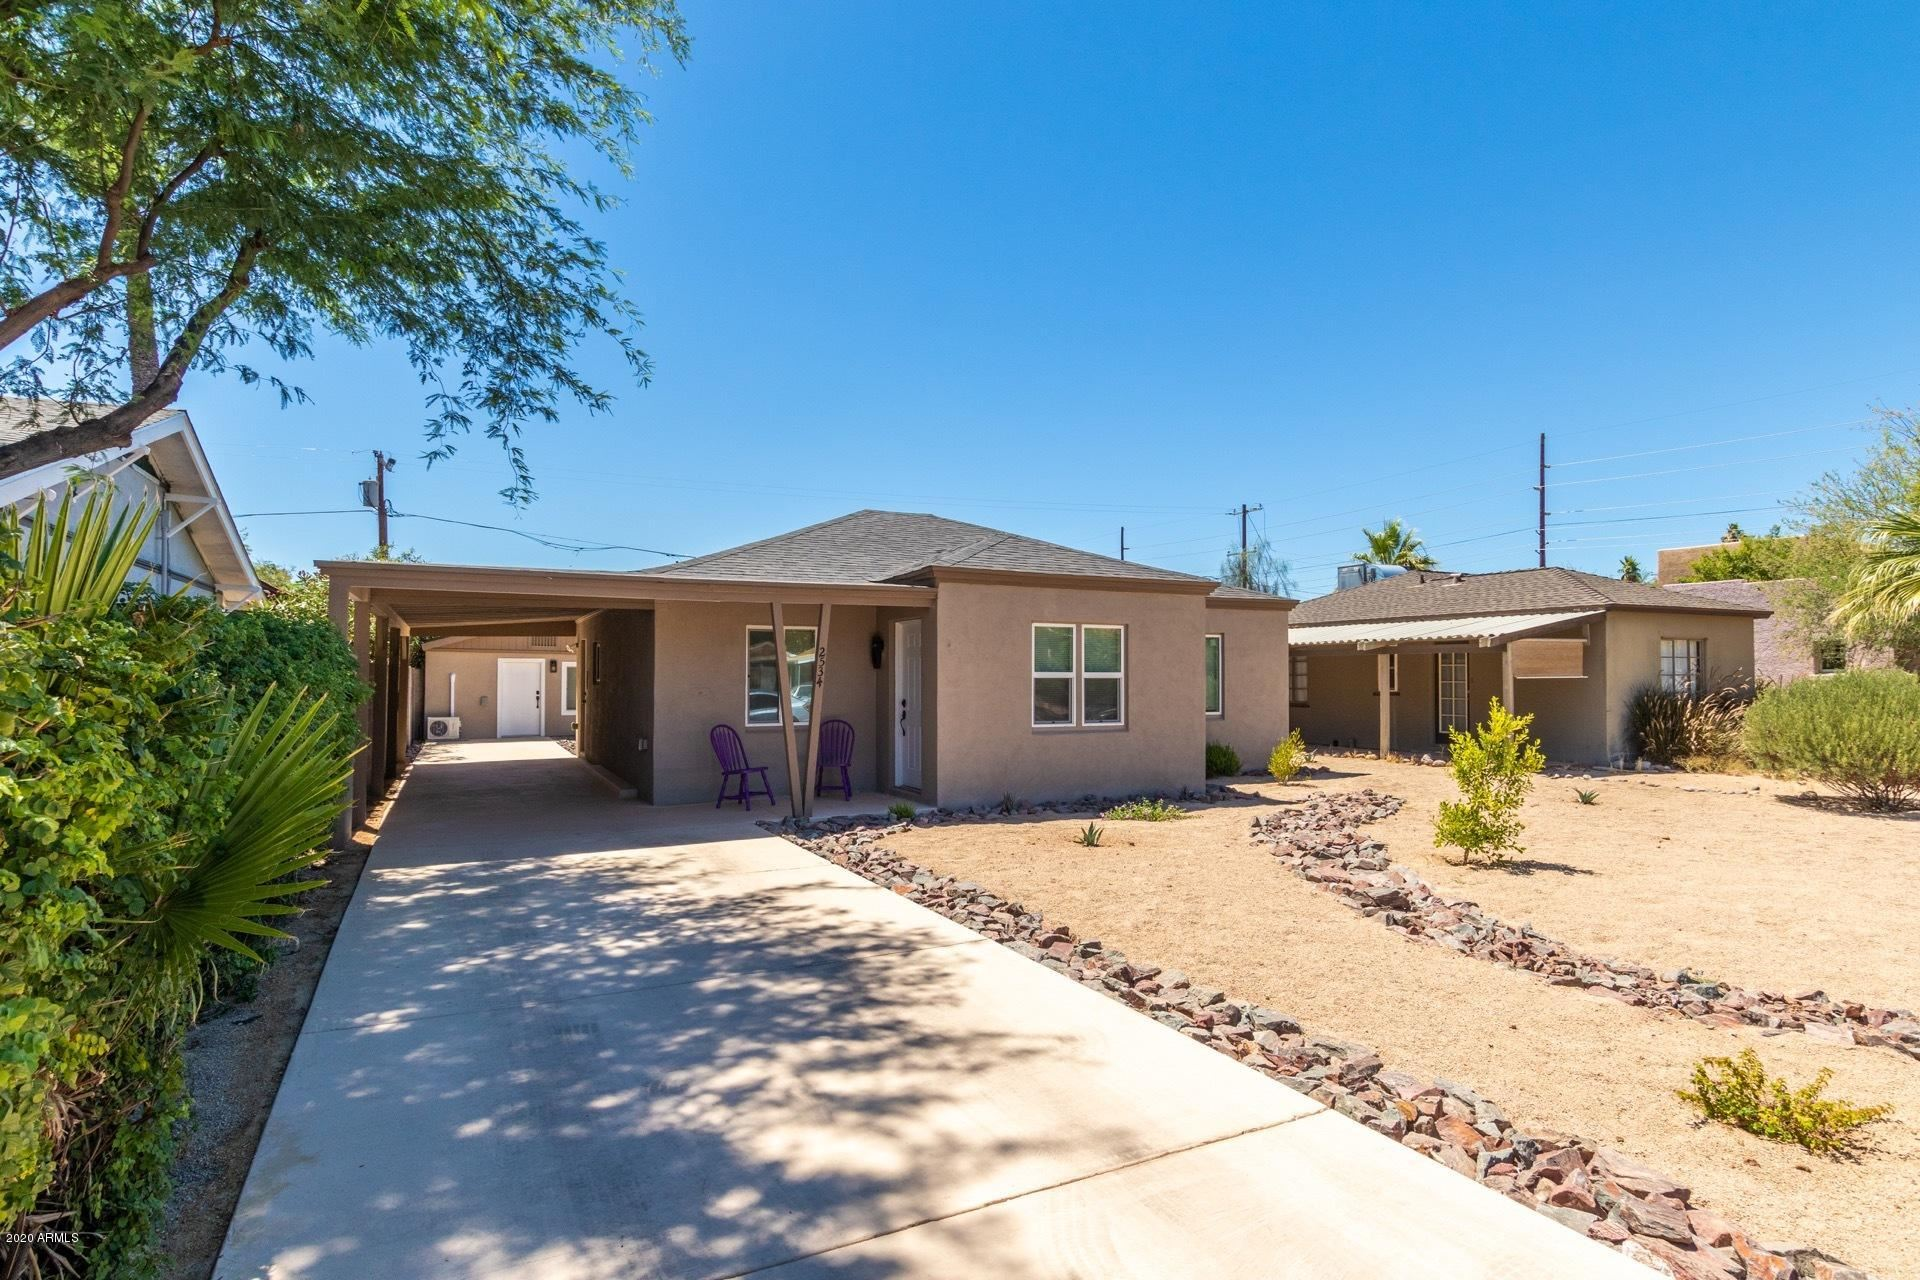 2534 N 9TH Street, Phoenix, AZ 85006 - MLS#: 6089446